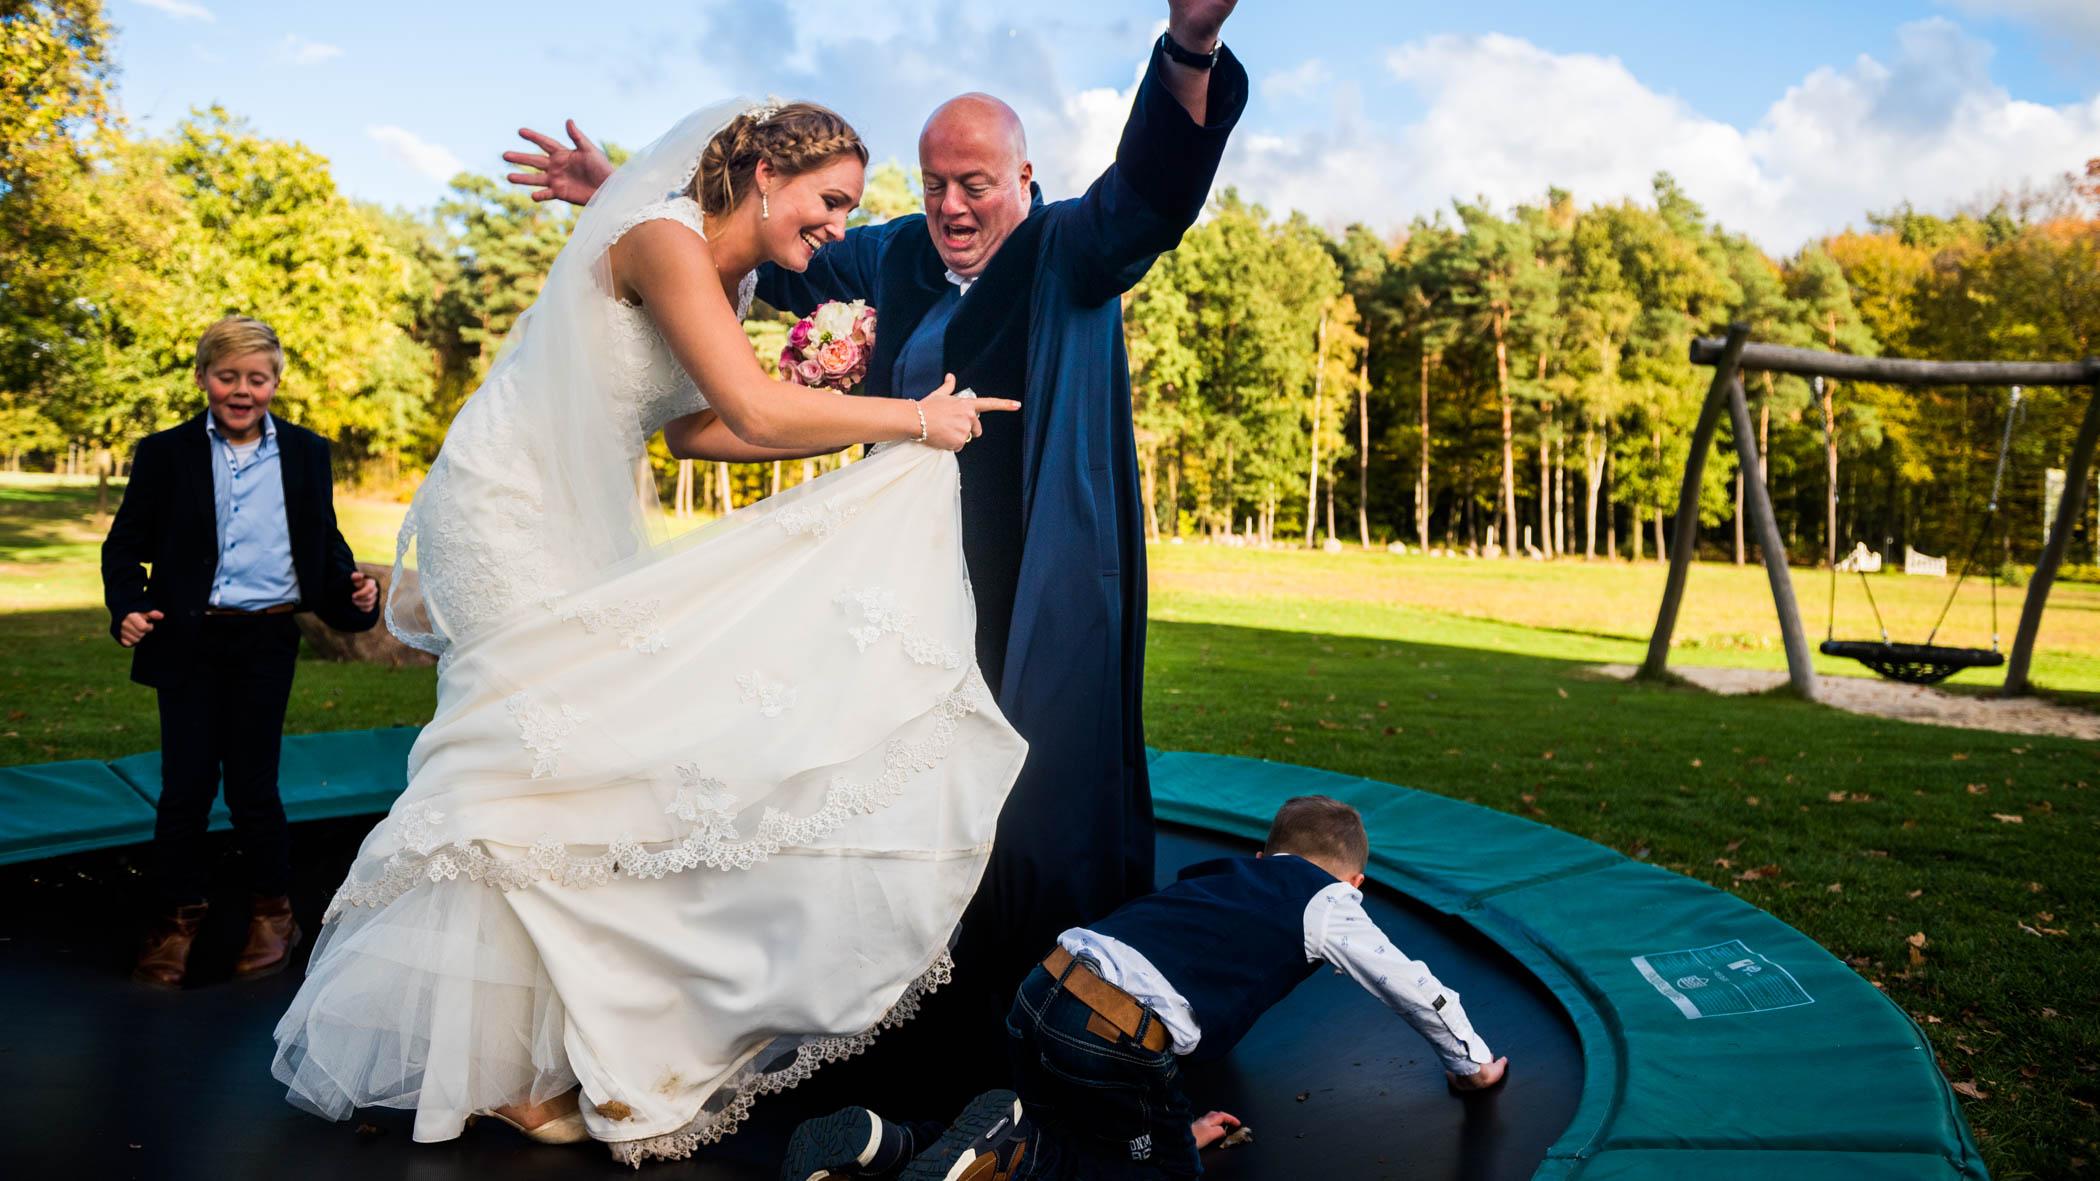 Martin Coers op de trampoline